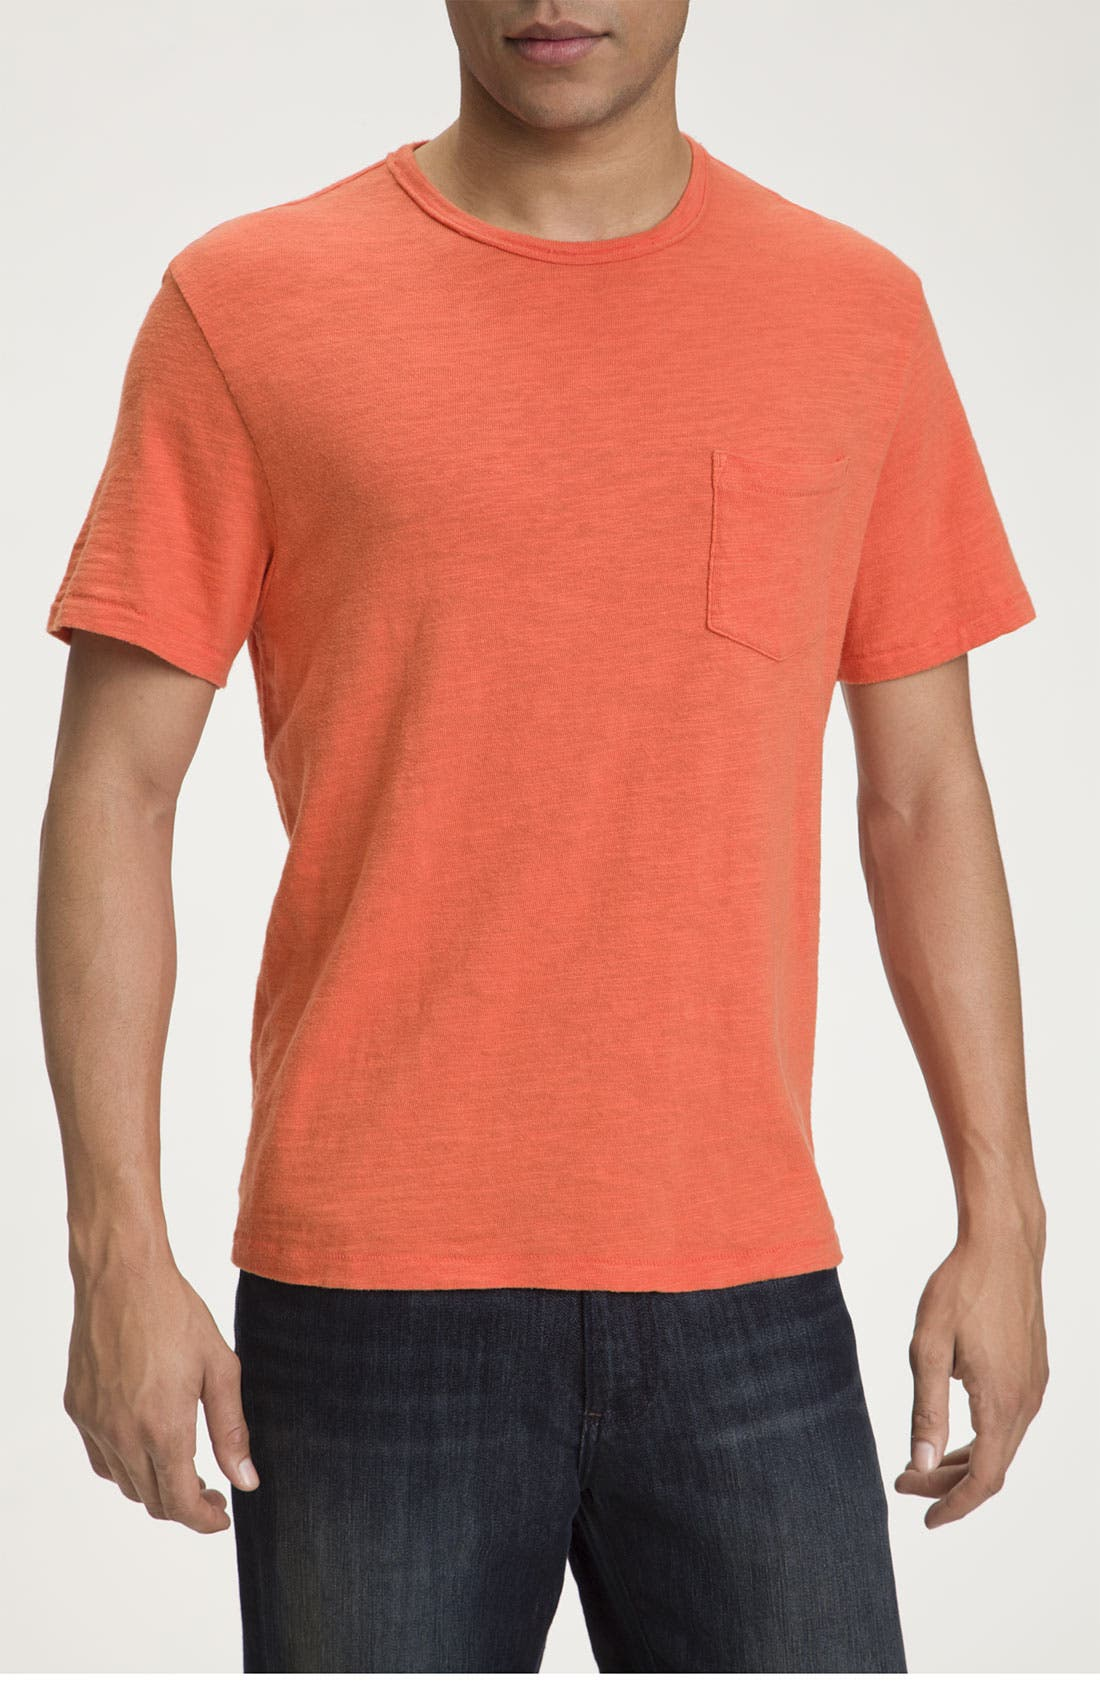 Alternate Image 1 Selected - rag & bone Pocket T-Shirt